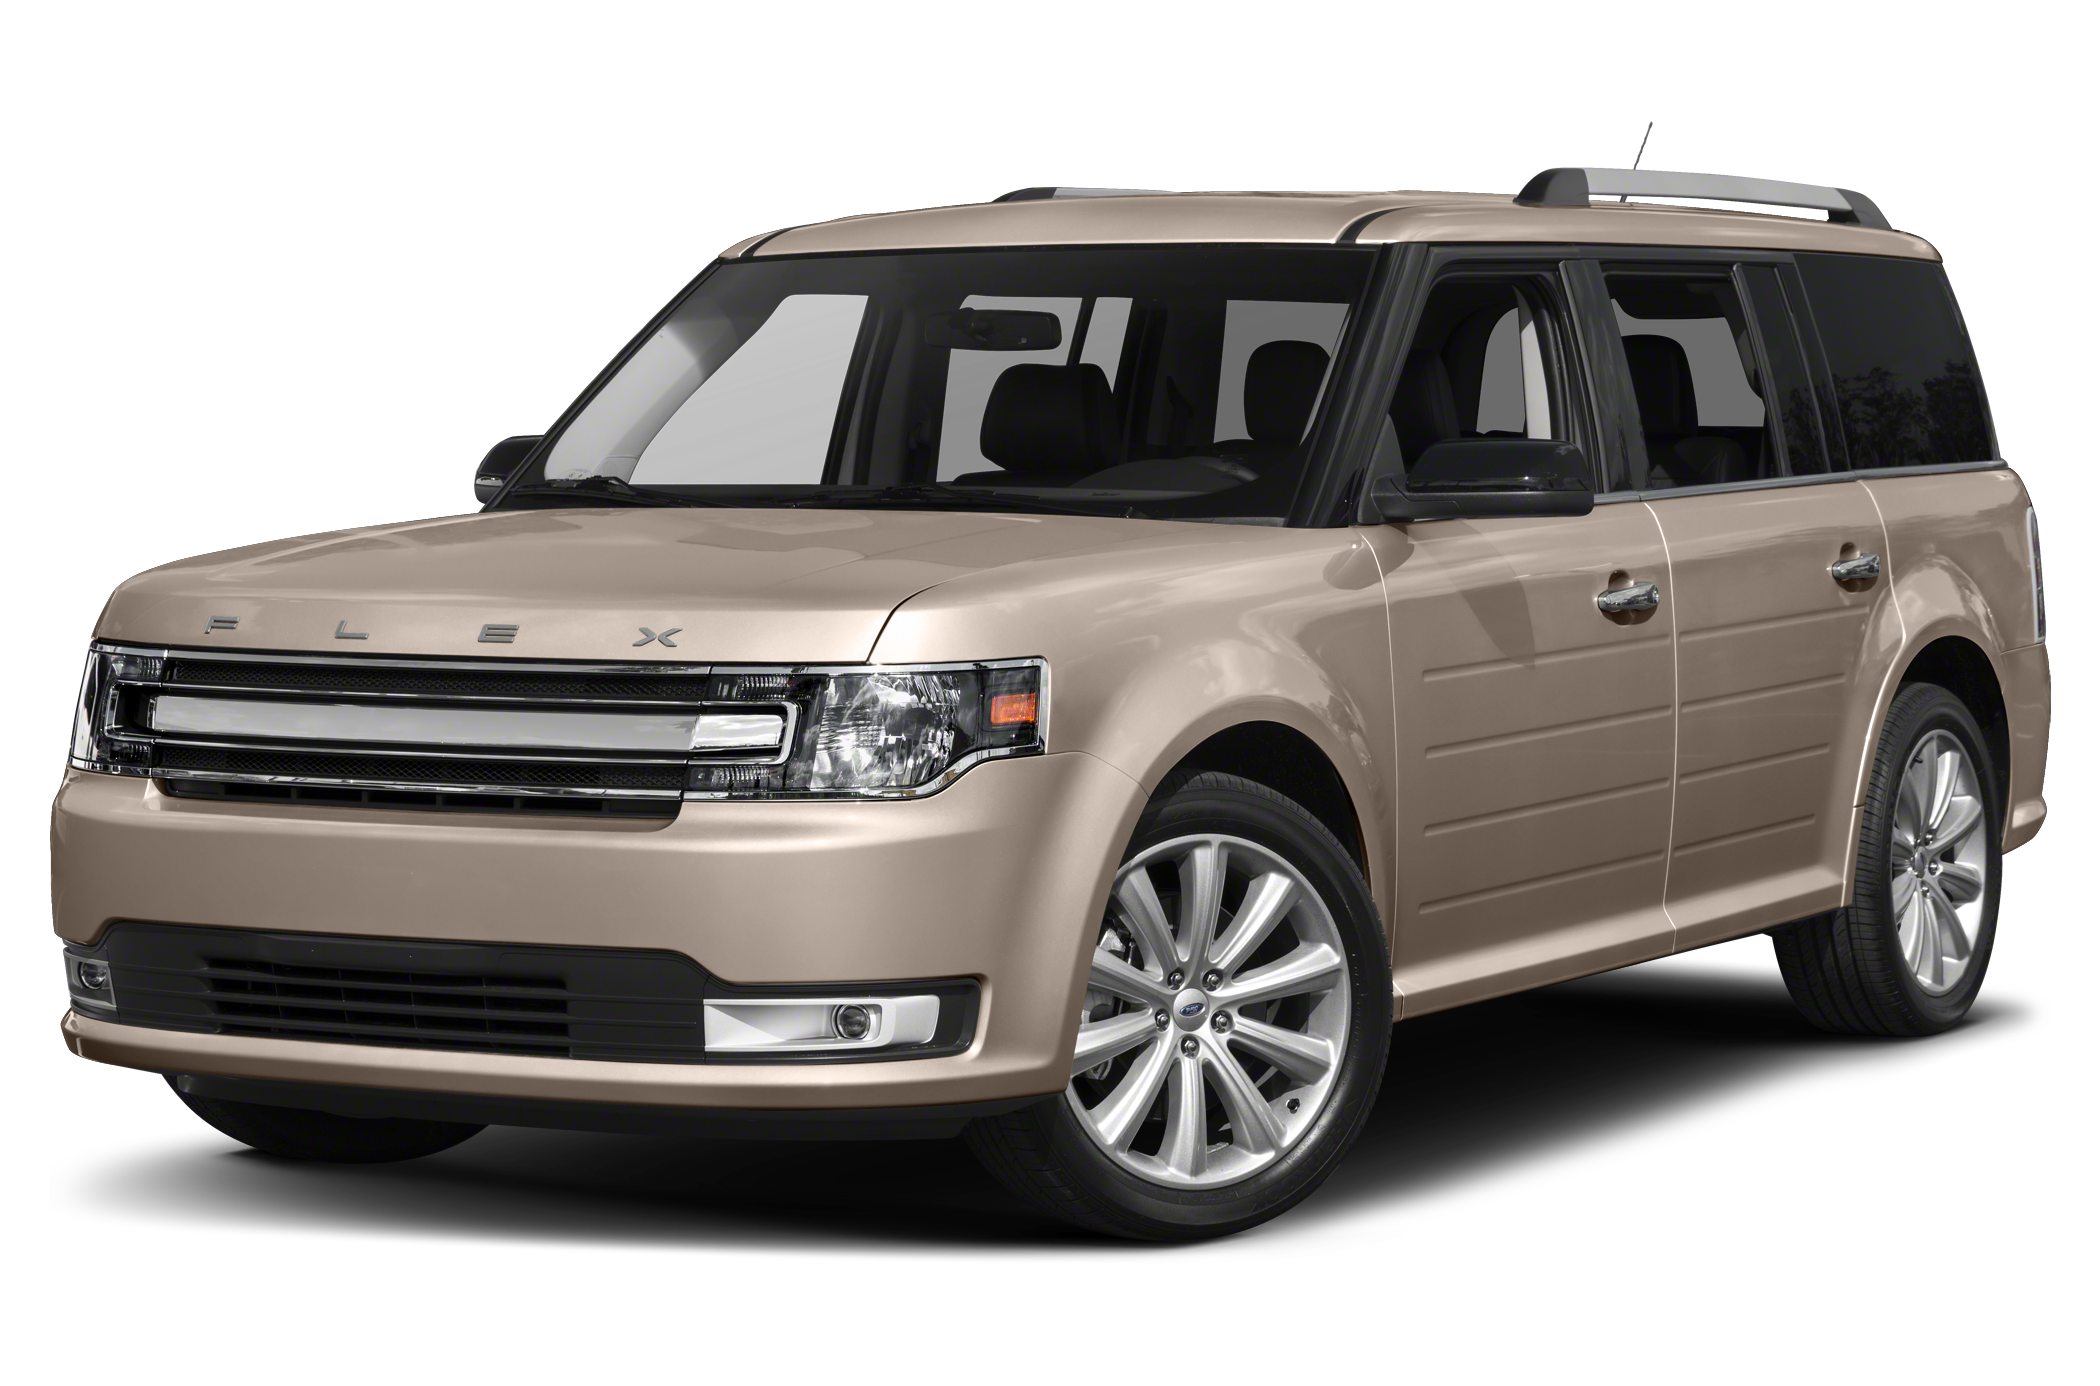 pare Ford Flex to Chevrolet Traverse